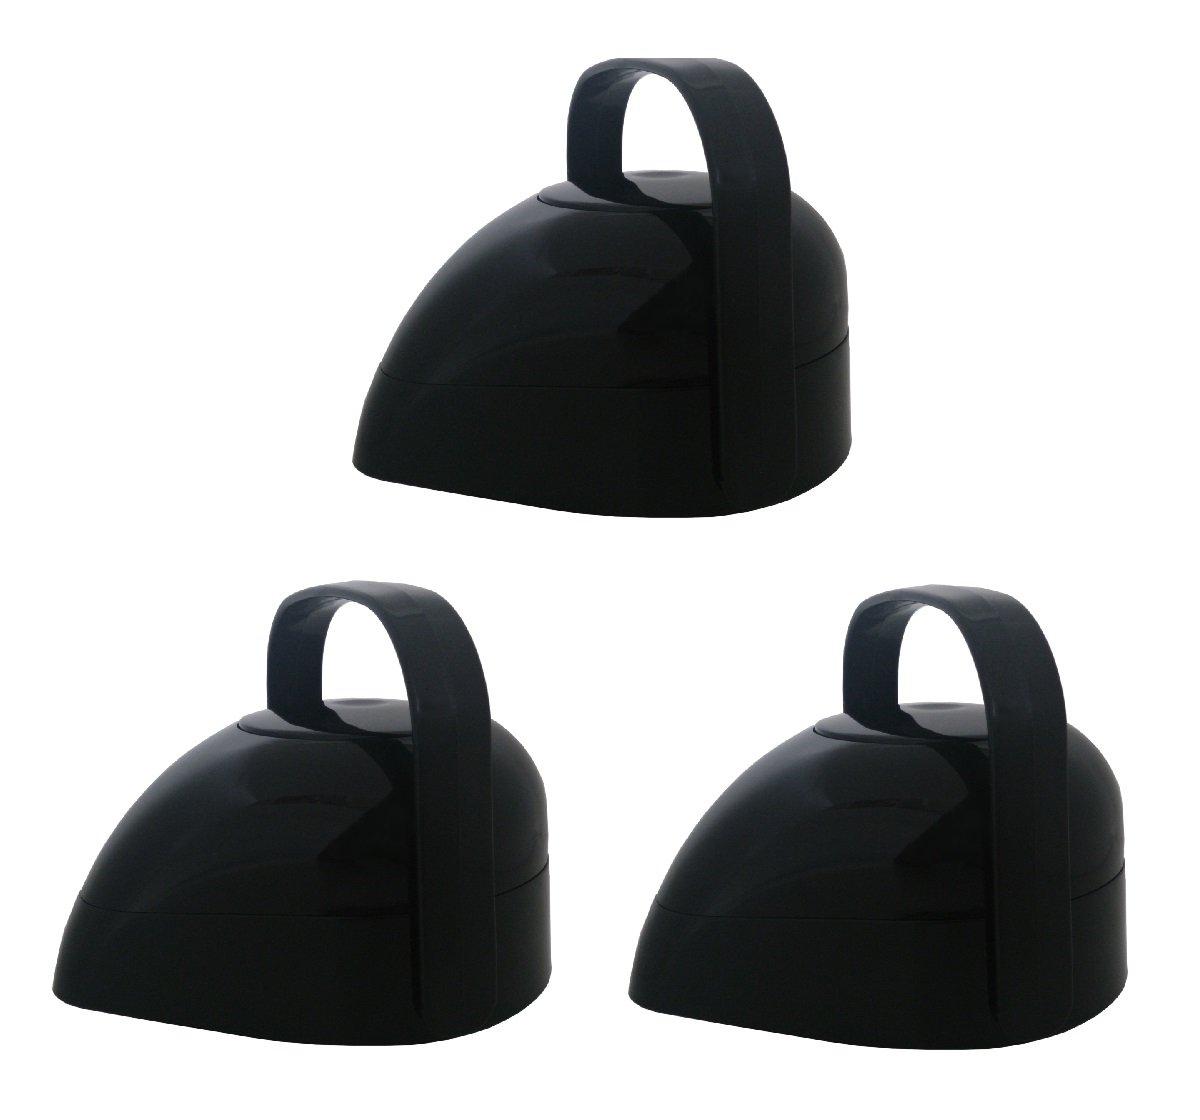 Imagem - Kit 3 Bombas de Pressão para Garrafa Térmica R-Evolution 1.9L Termolar cód: